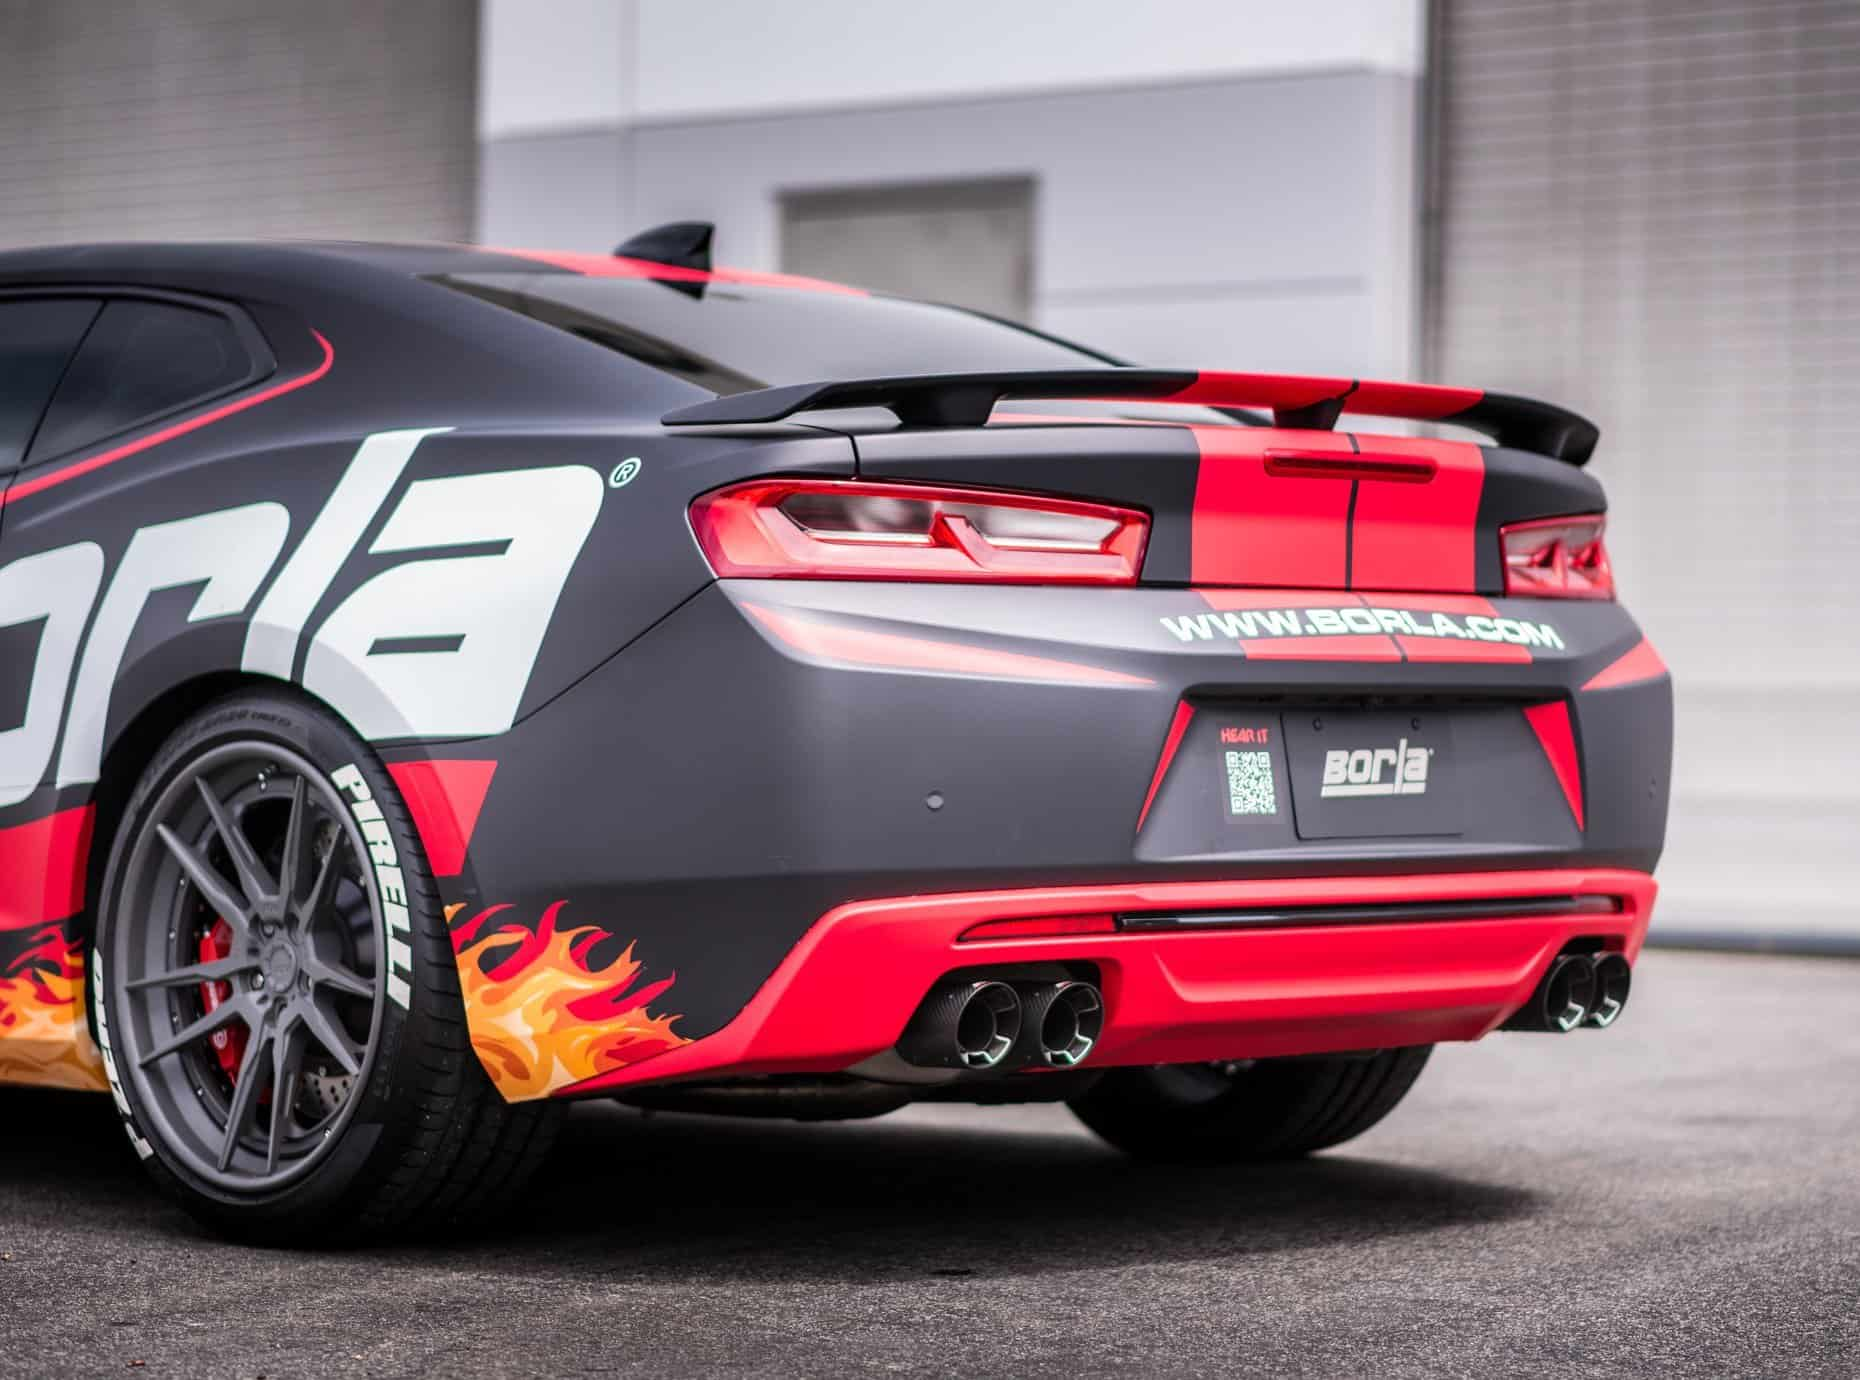 2016 2017 Camaro Ss Borla Cat Back Exhaust Atak With Carbon Fiber Tips 140688cf